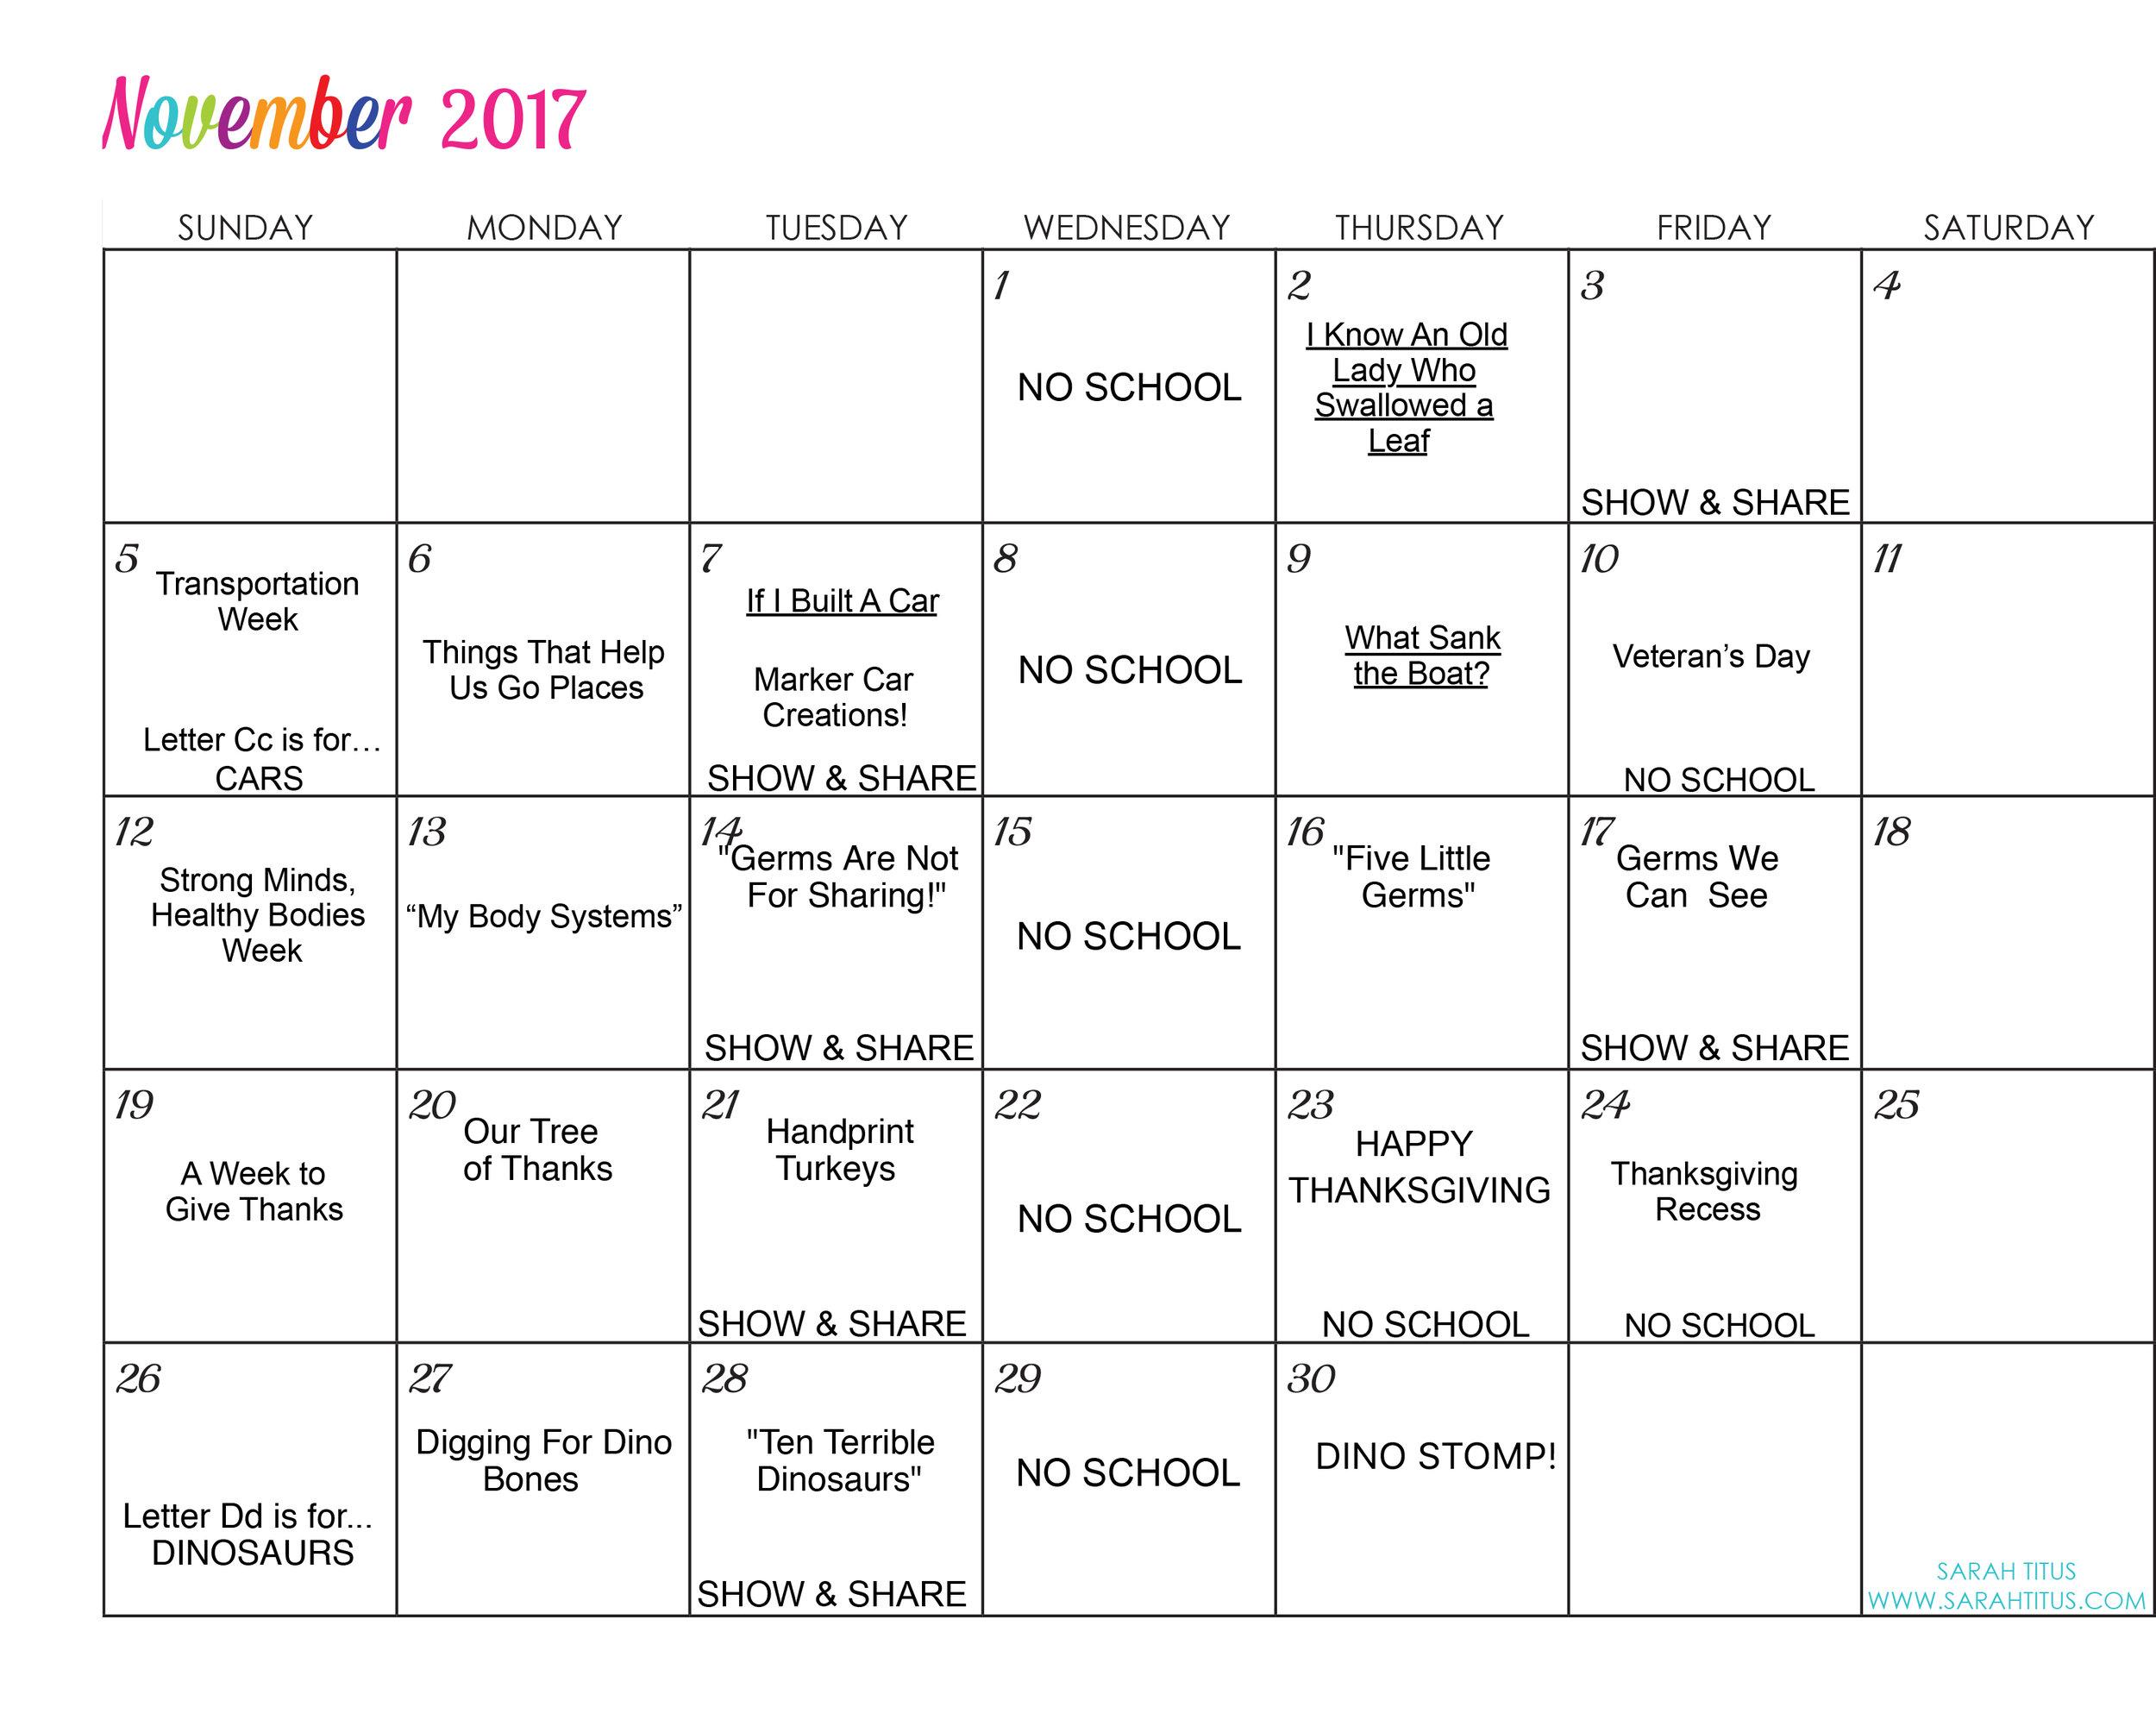 HS&J November 2017 Calendar.jpg